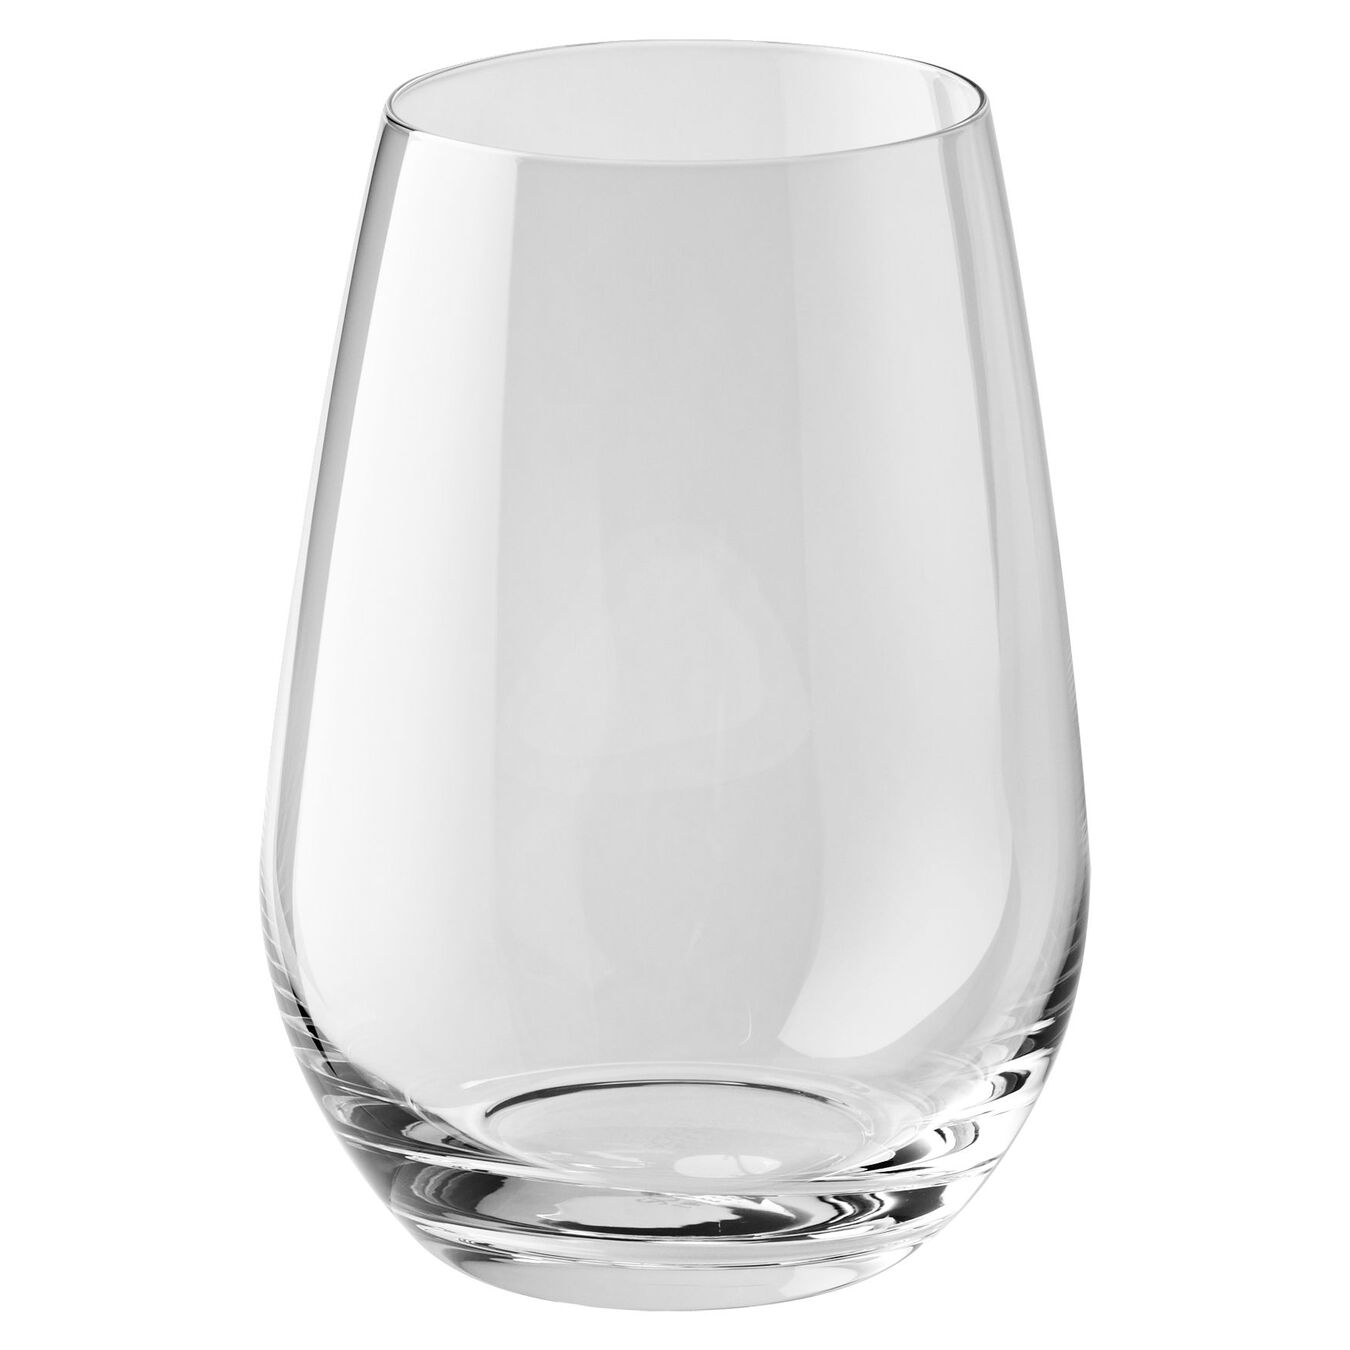 Cocktailglas 575 ml,,large 1